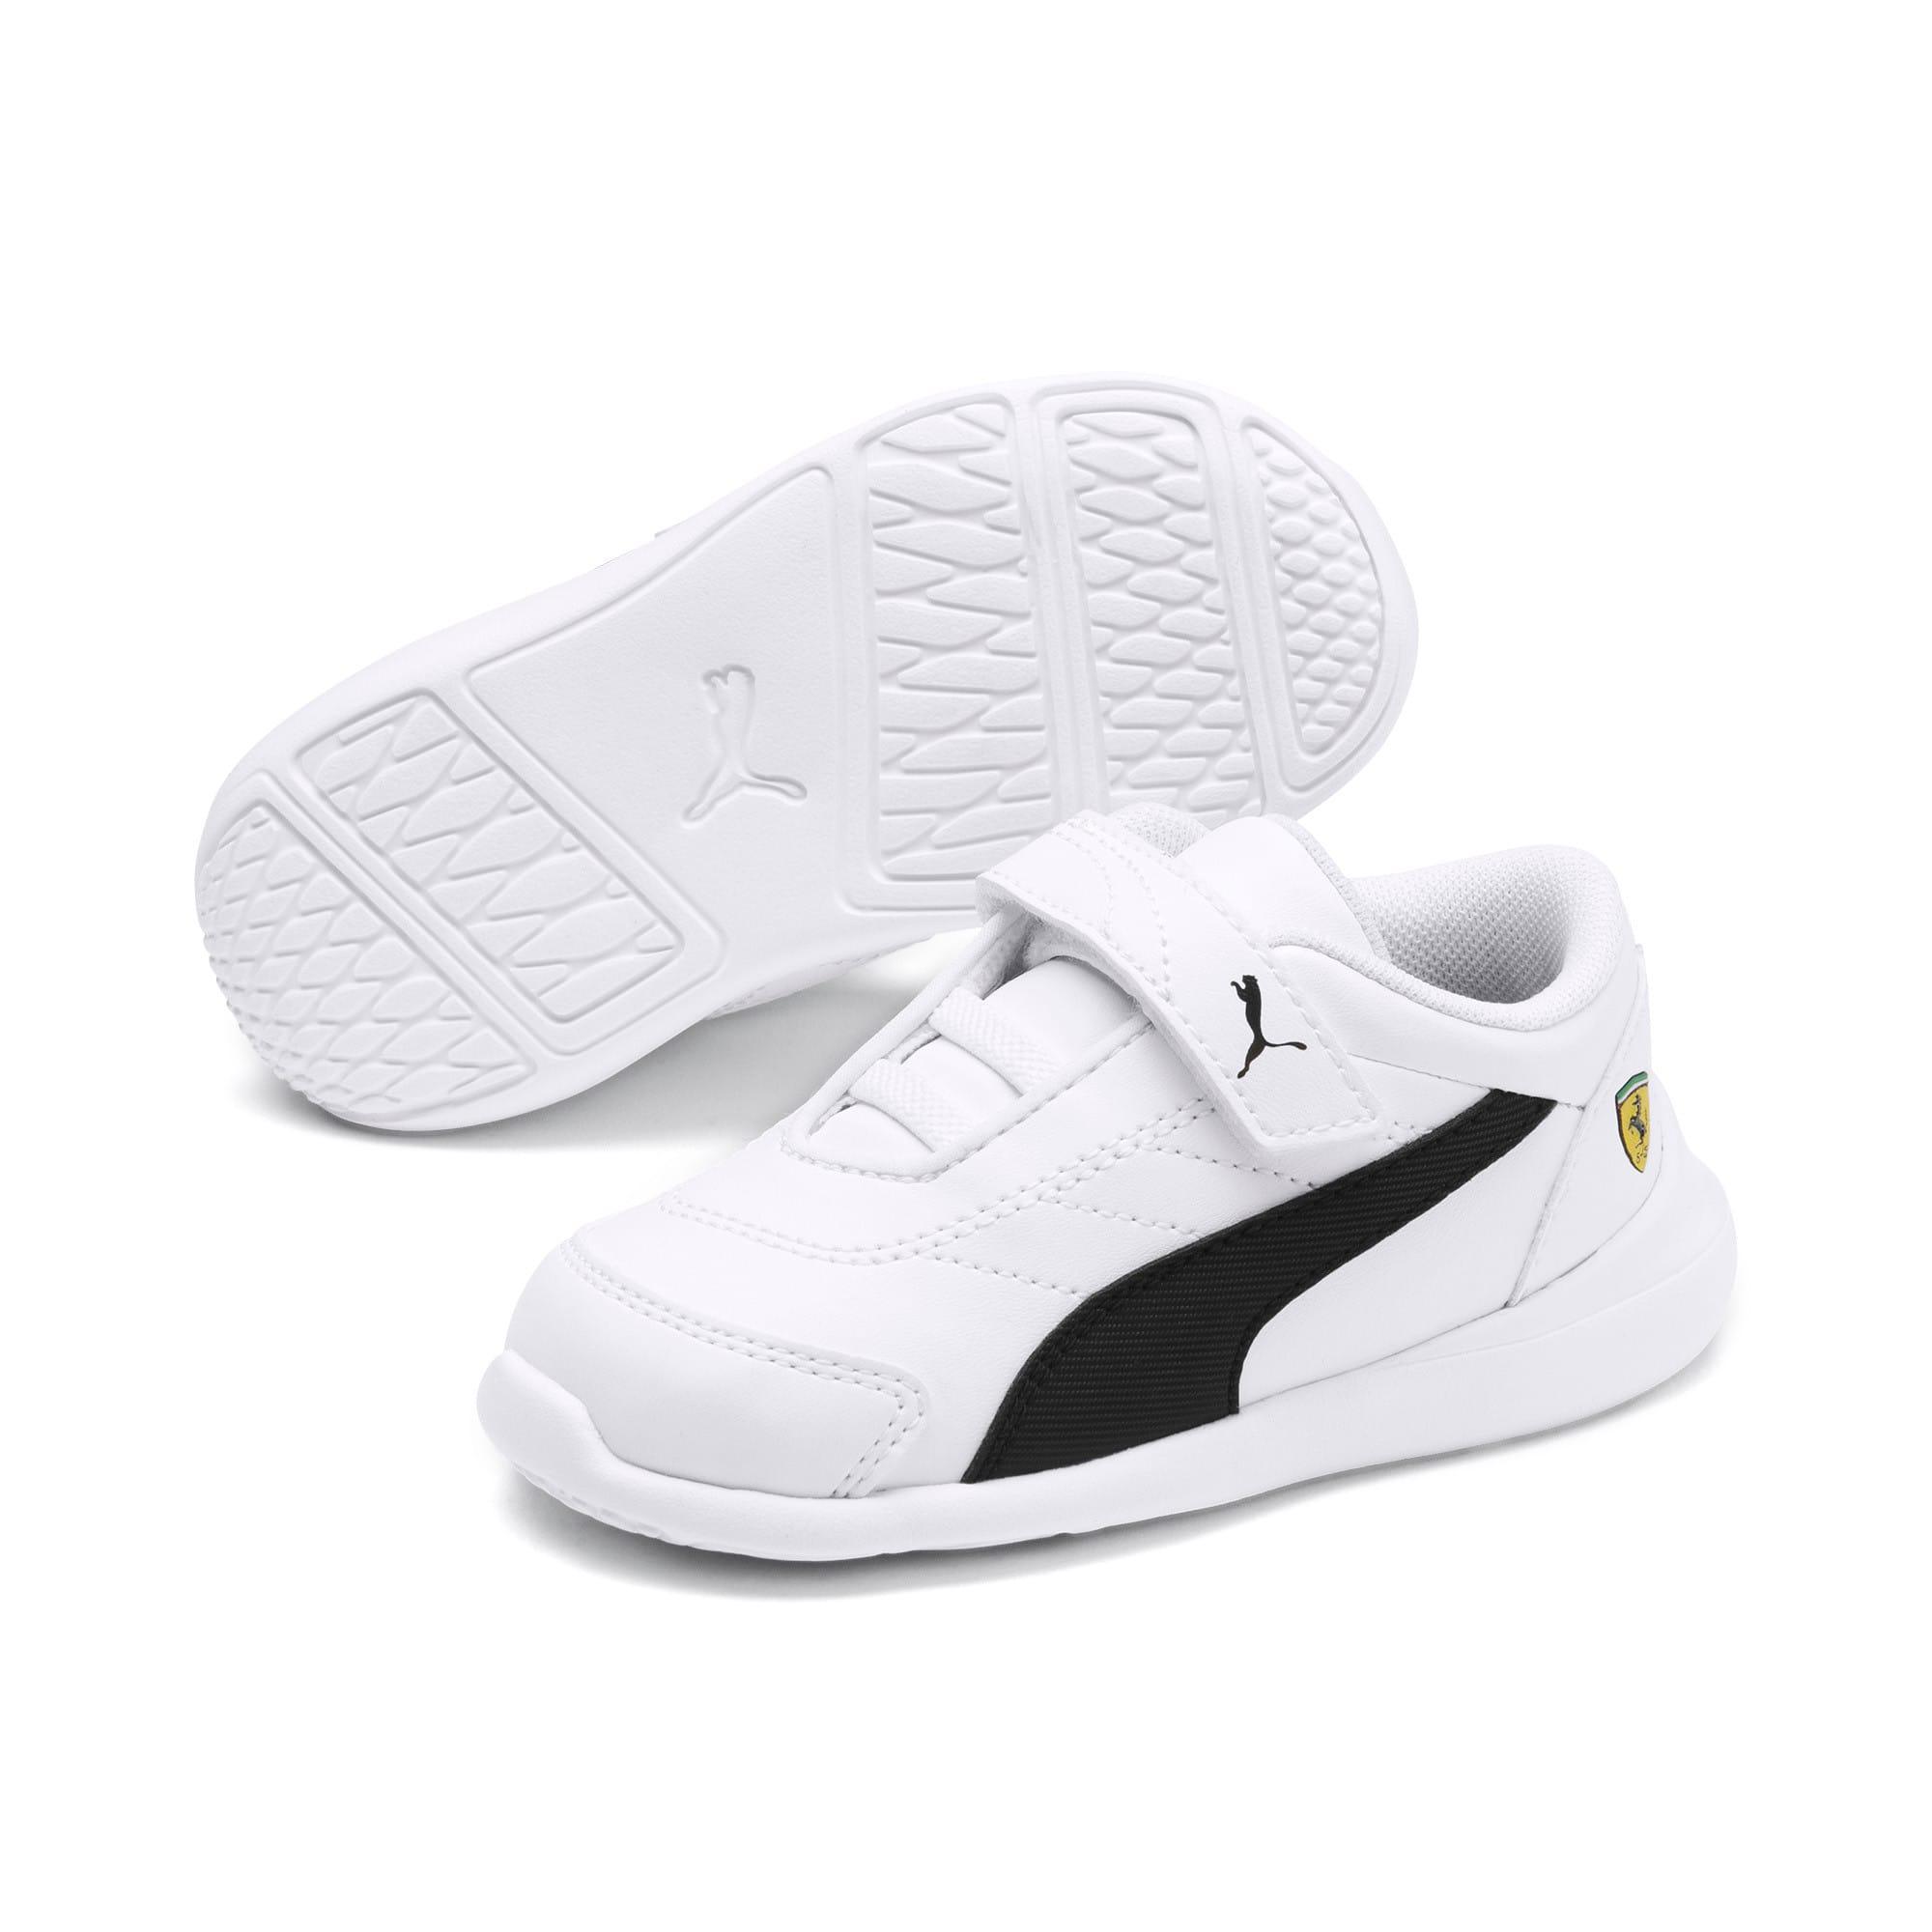 Thumbnail 2 of Scuderia Ferrari Kart Cat III Toddler Shoes, White-Black-Rosso Corsa, medium